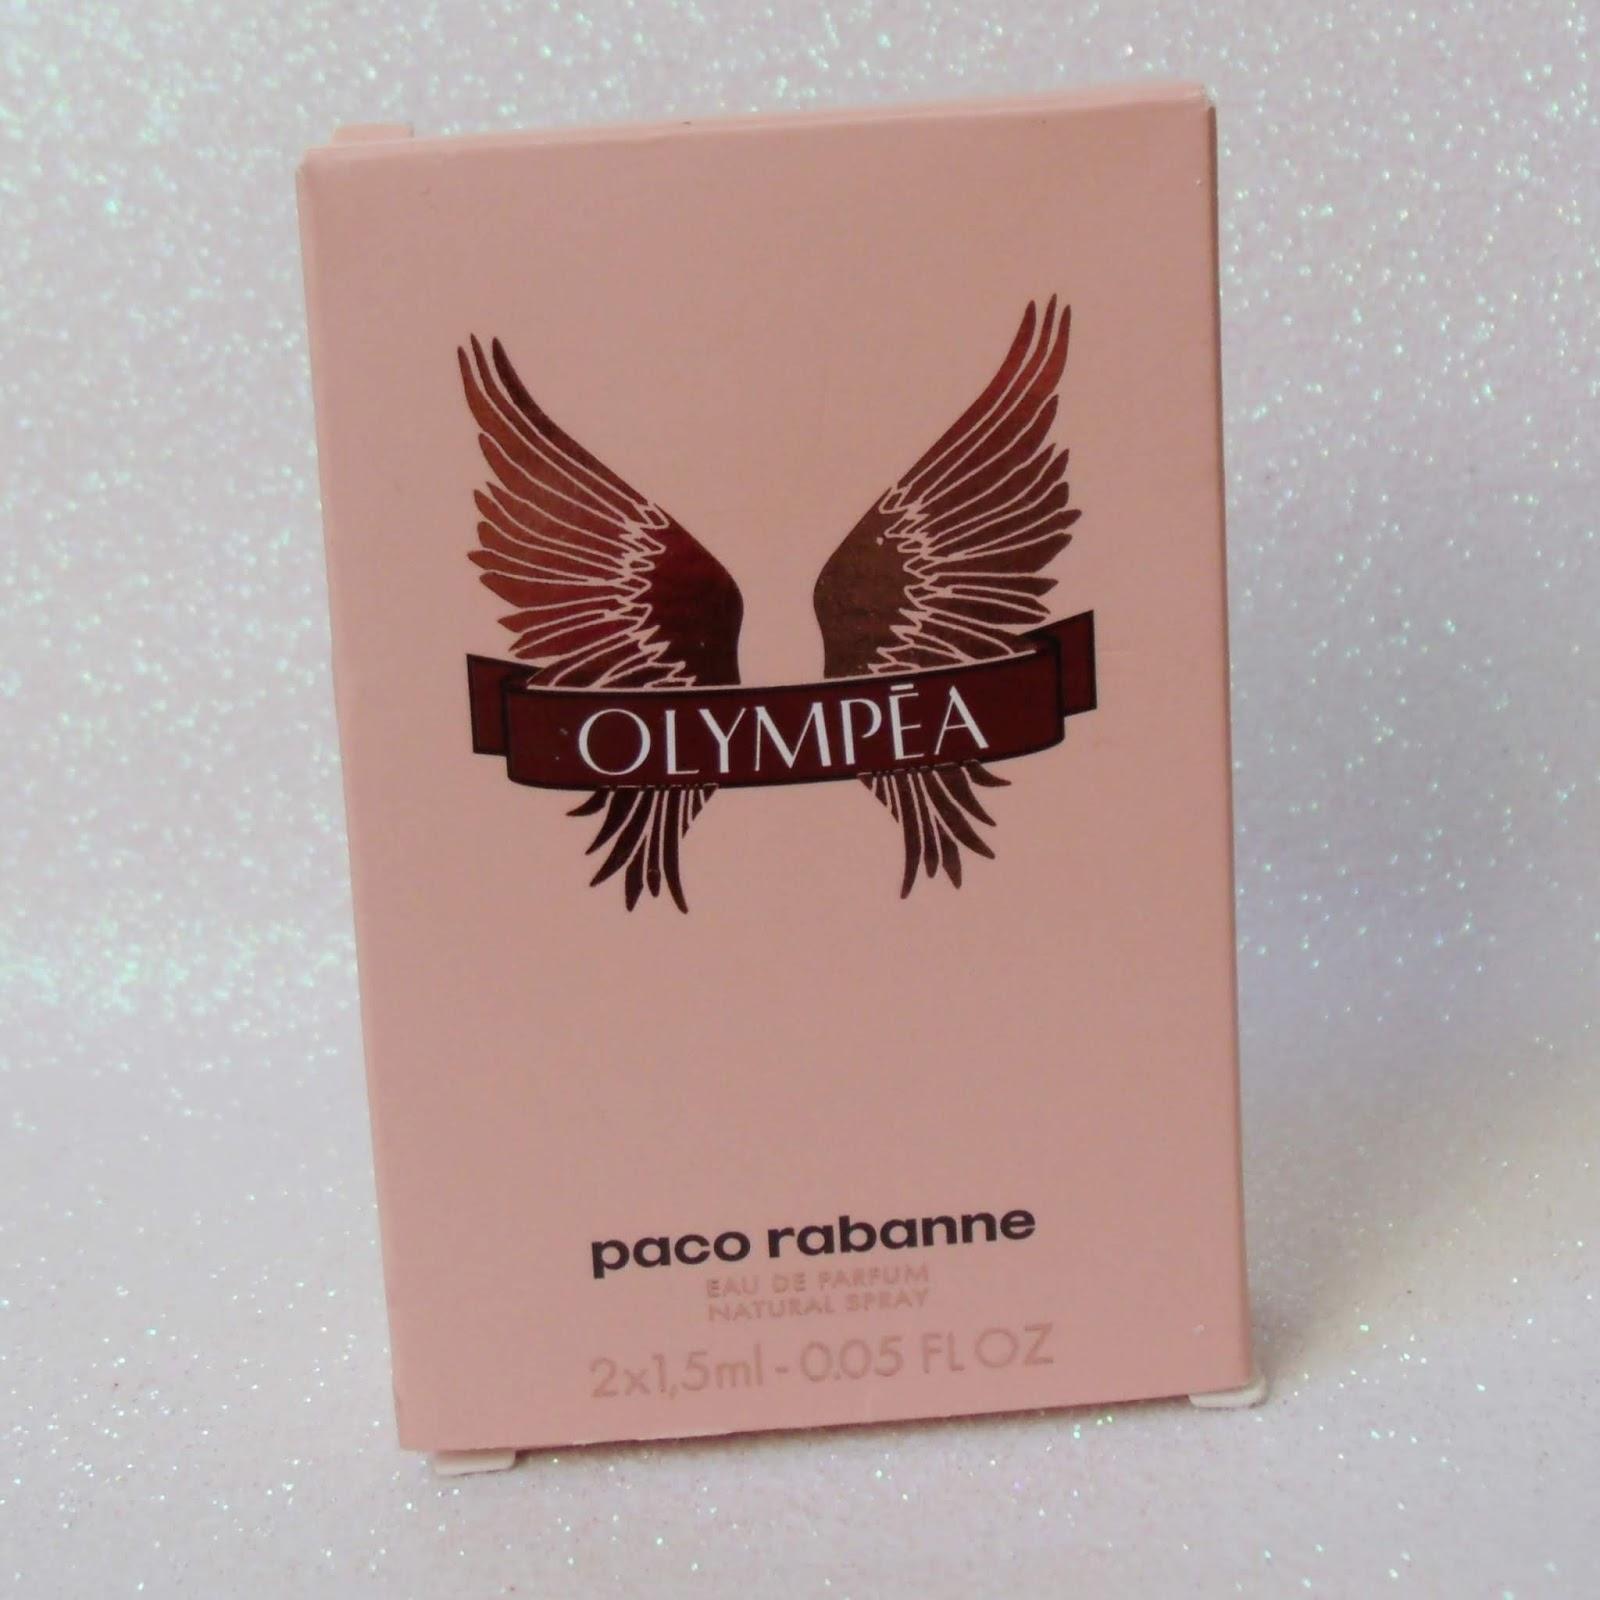 TESTEI E GOSTEI: PERFUME OLYMPÉA DA PACO RABANNE.